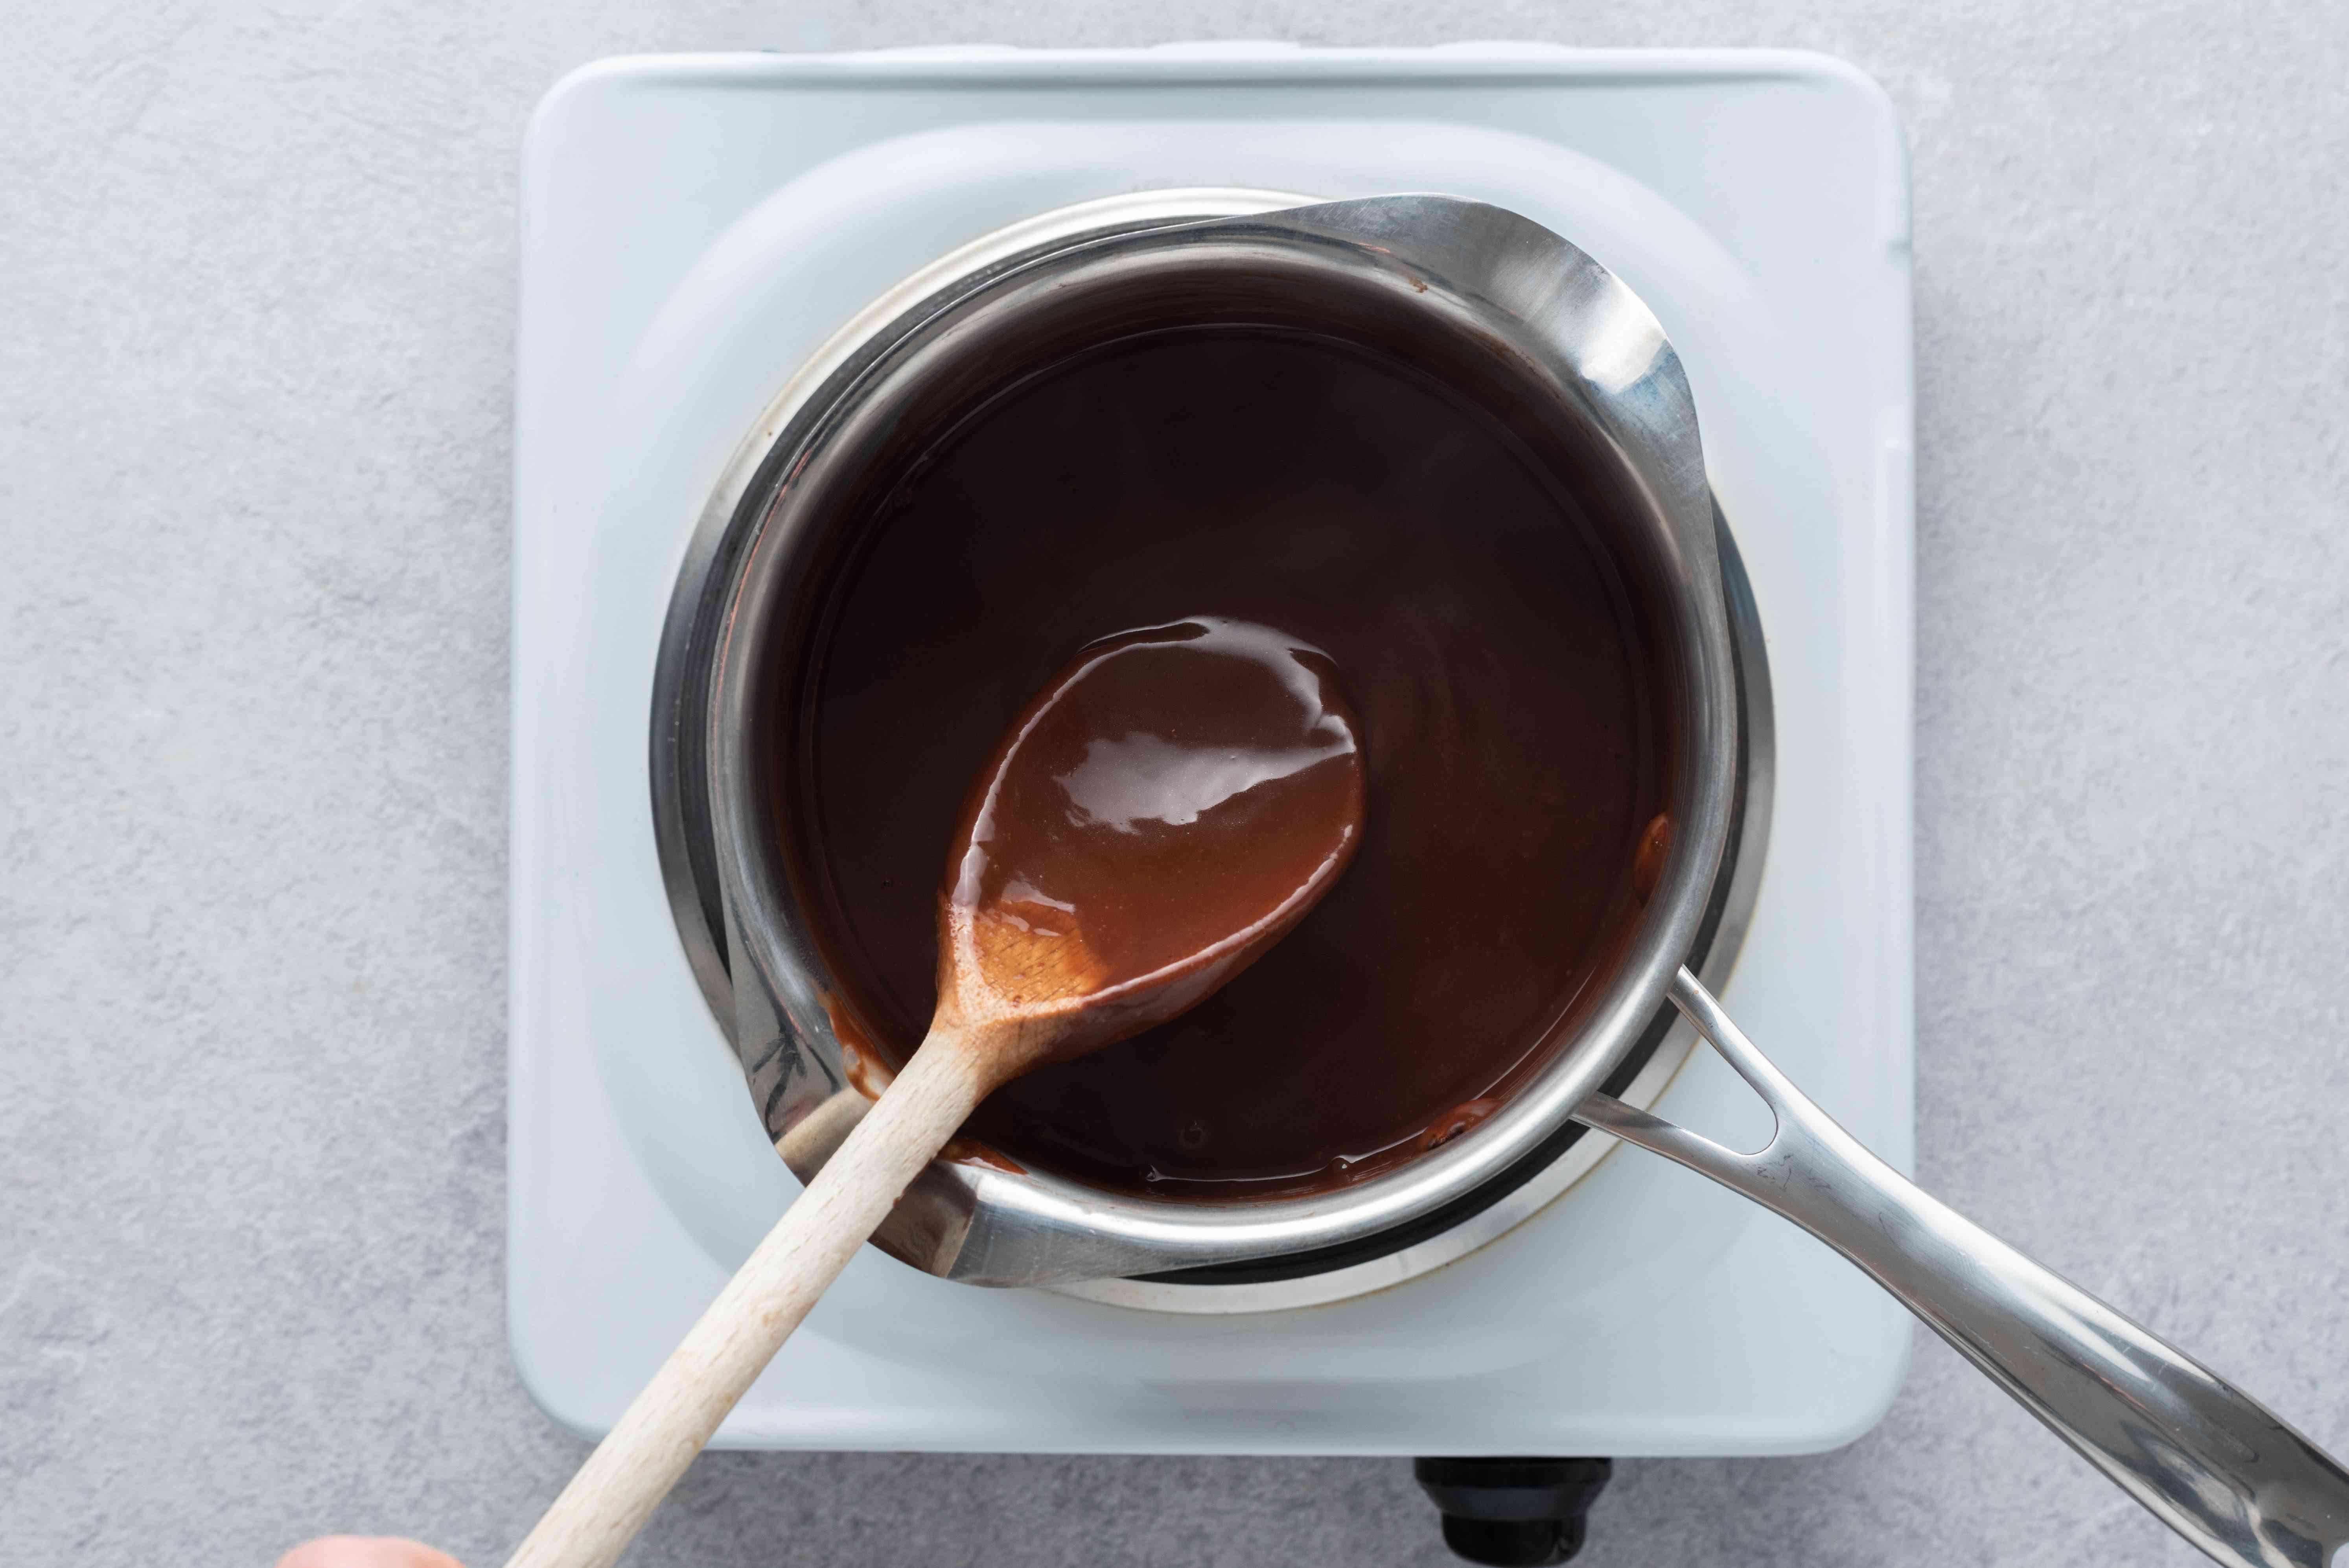 stir the vegan pudding in the saucepan